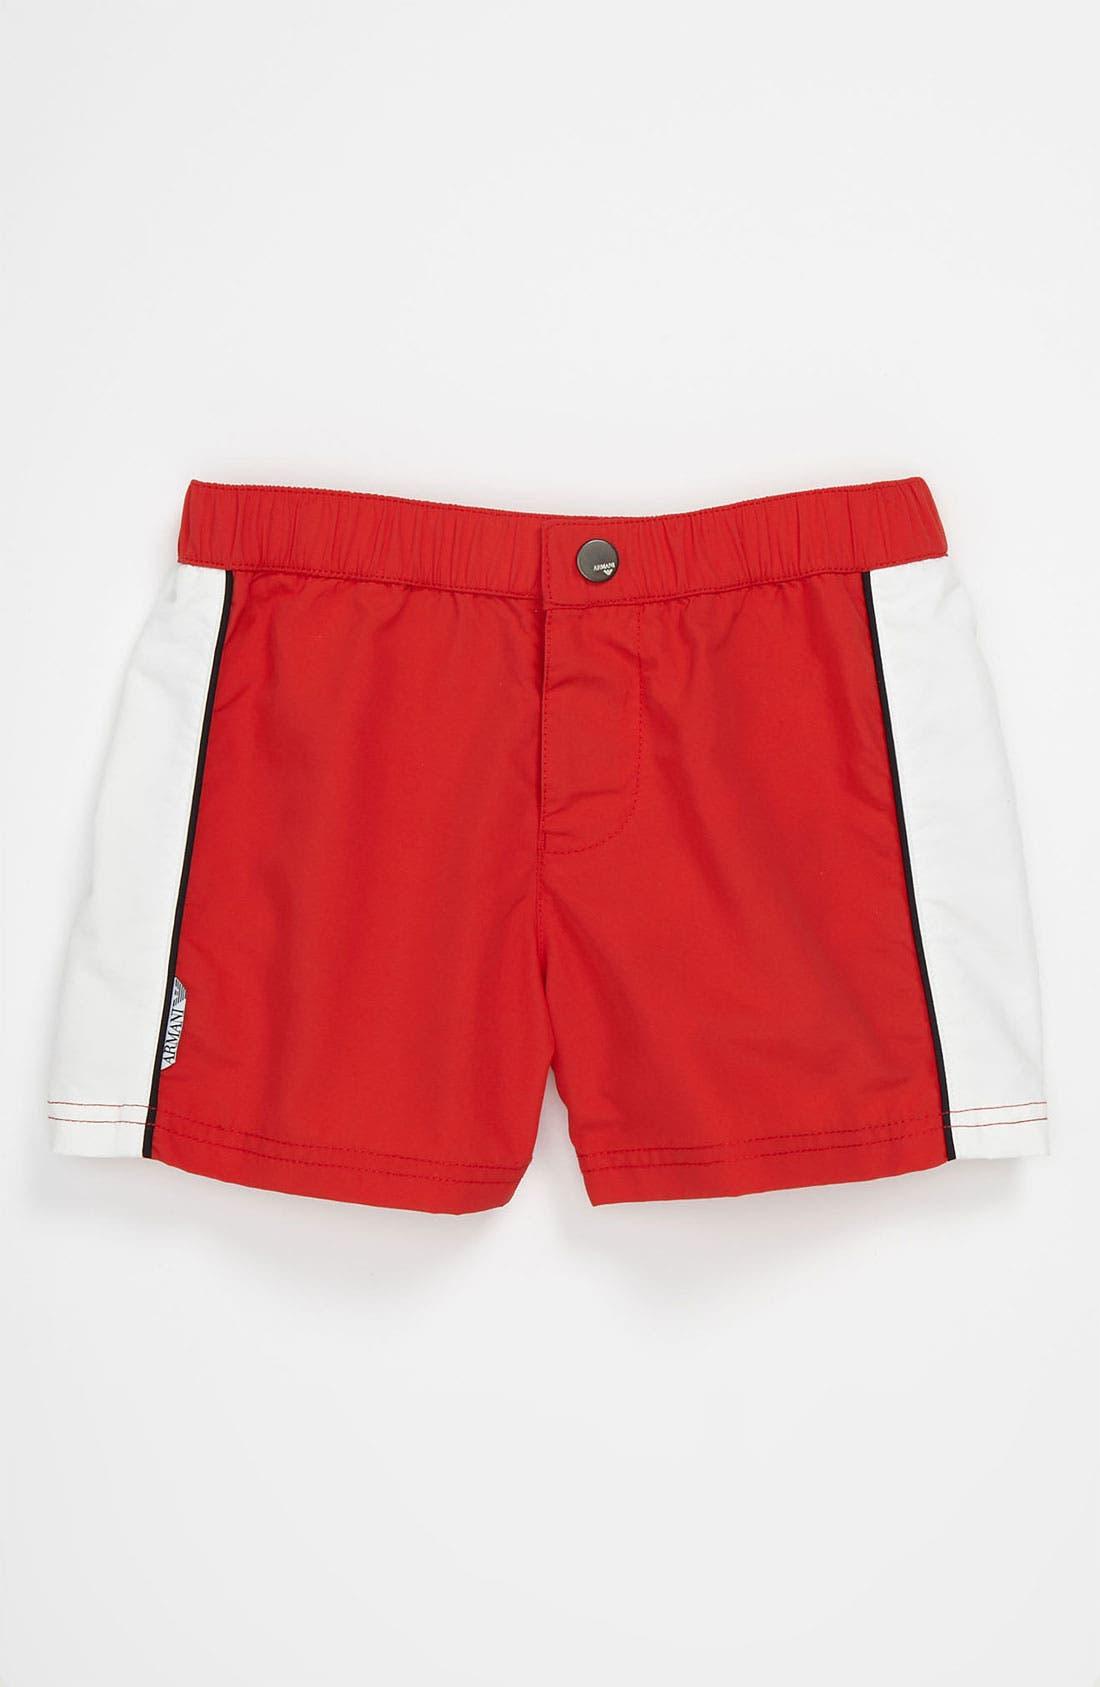 Main Image - Armani Junior Swim Trunks (Toddler & Little Boys)